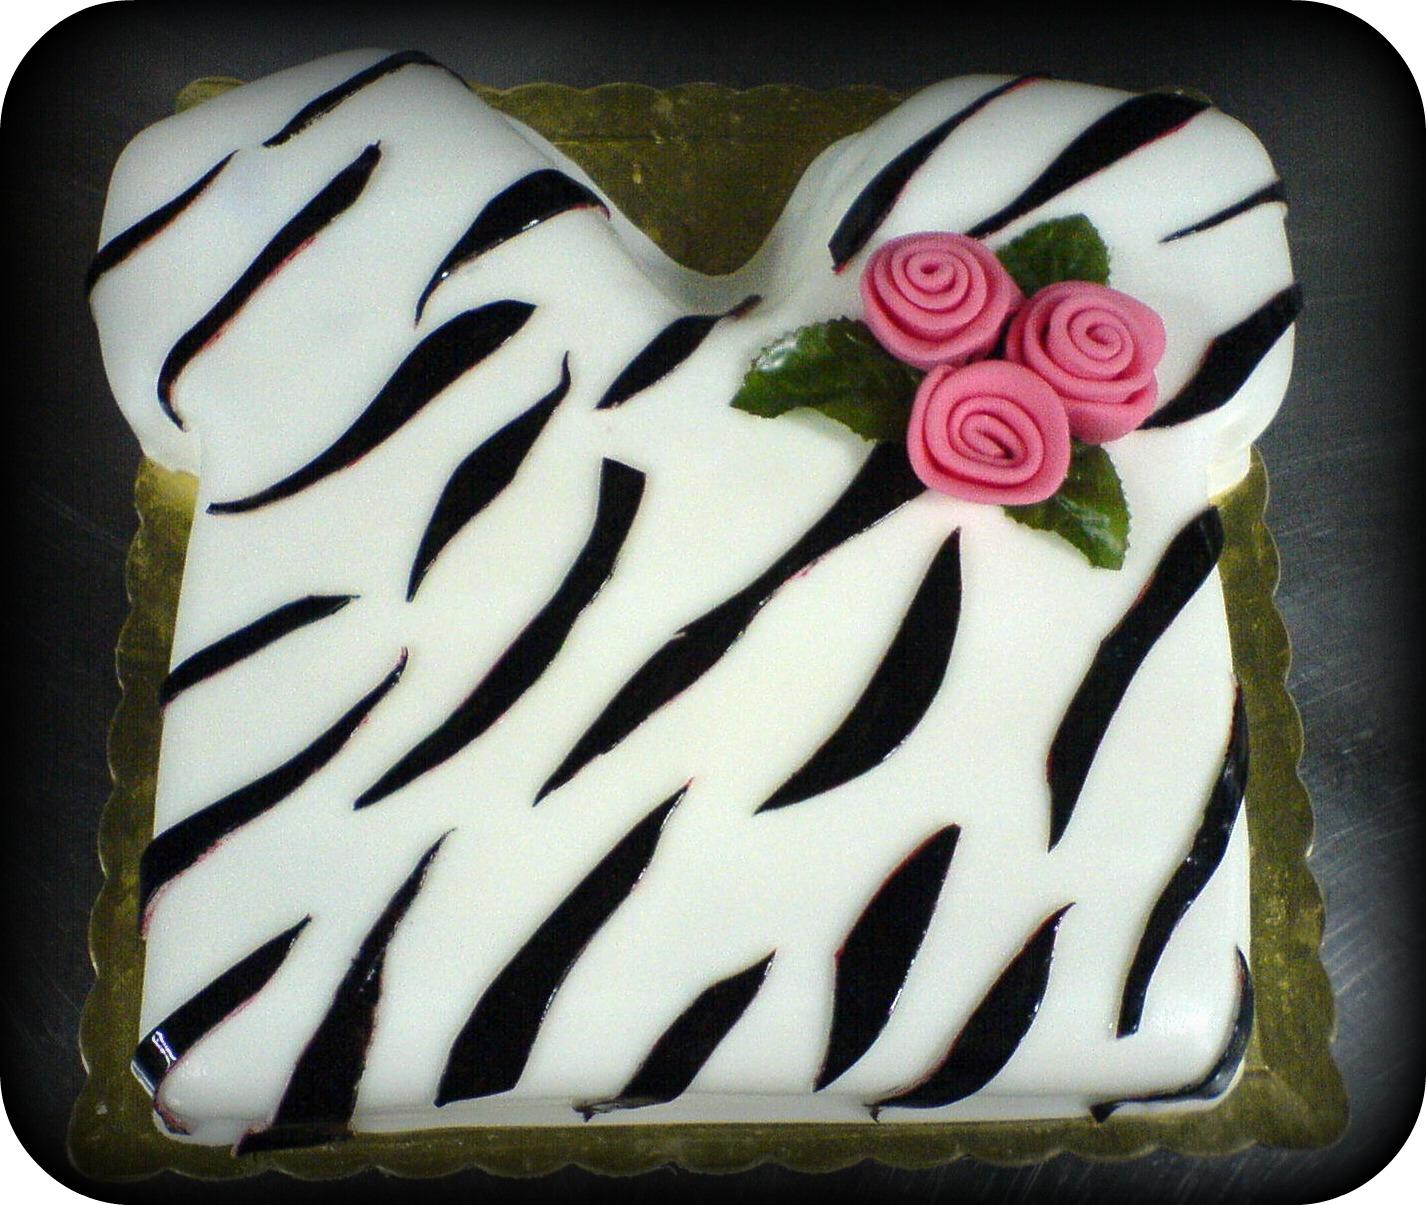 Zebra print T shirt cake